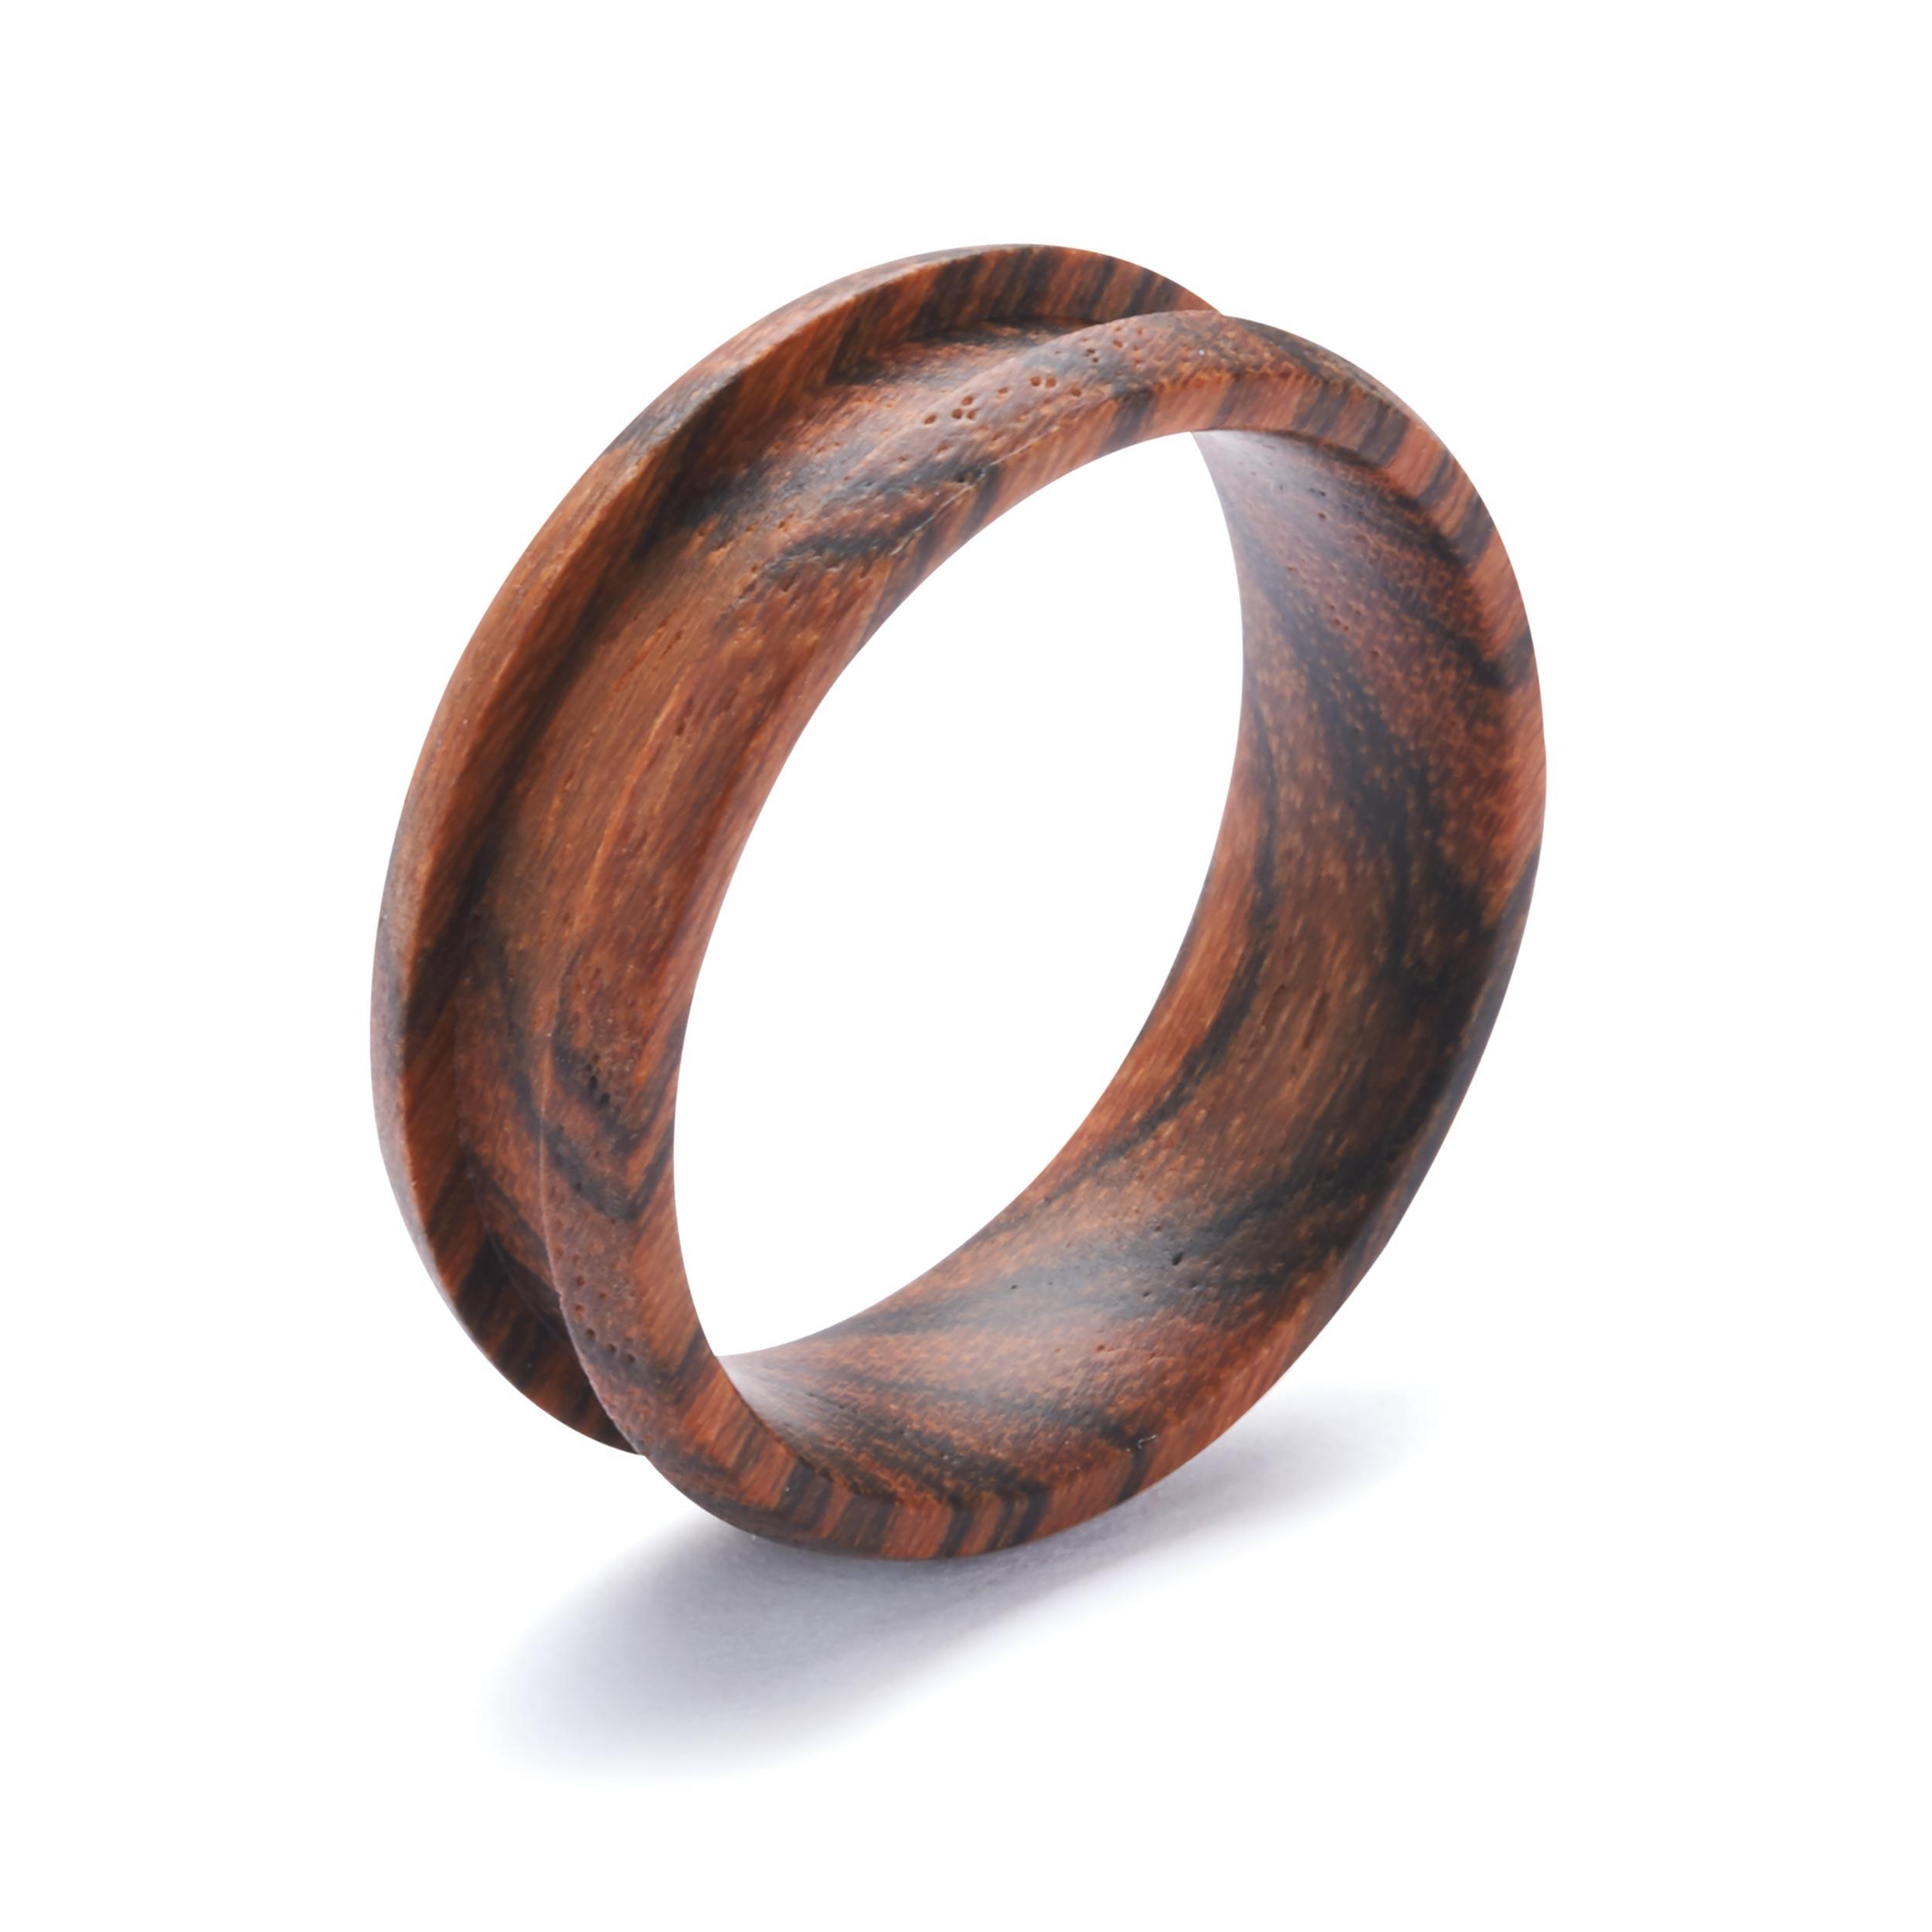 Comfort Ring Core - Bocote - 8mm, Size 11.5